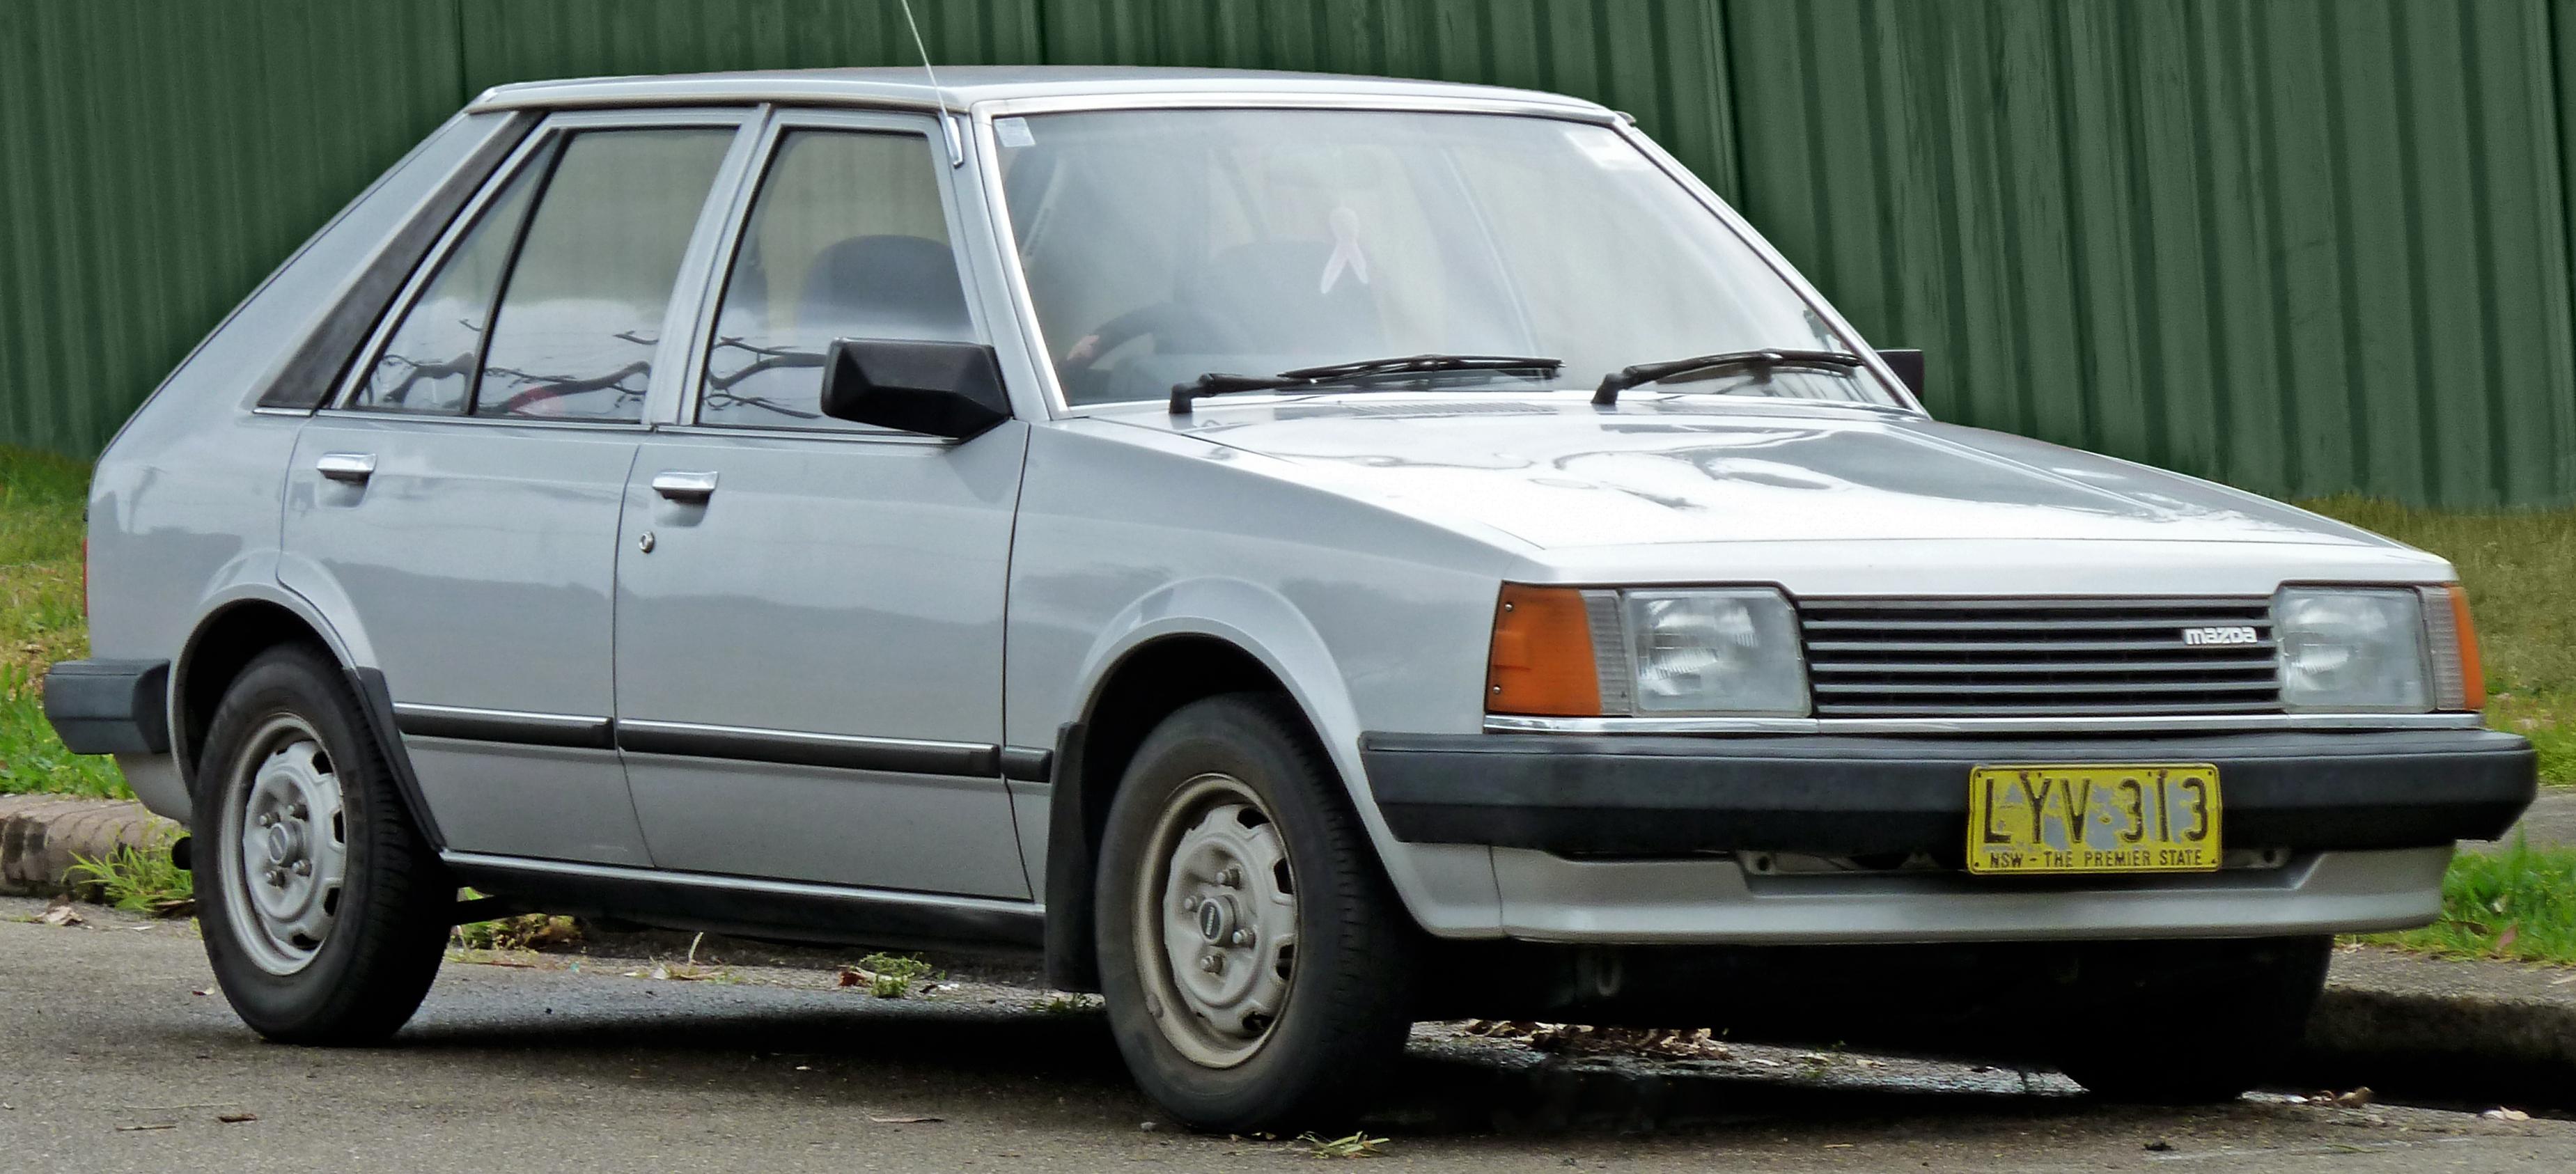 File1980-1982 Mazda 323 (BD) Deluxe 5-door hatchback ( & File:1980-1982 Mazda 323 (BD) Deluxe 5-door hatchback (2010-10-02 ...